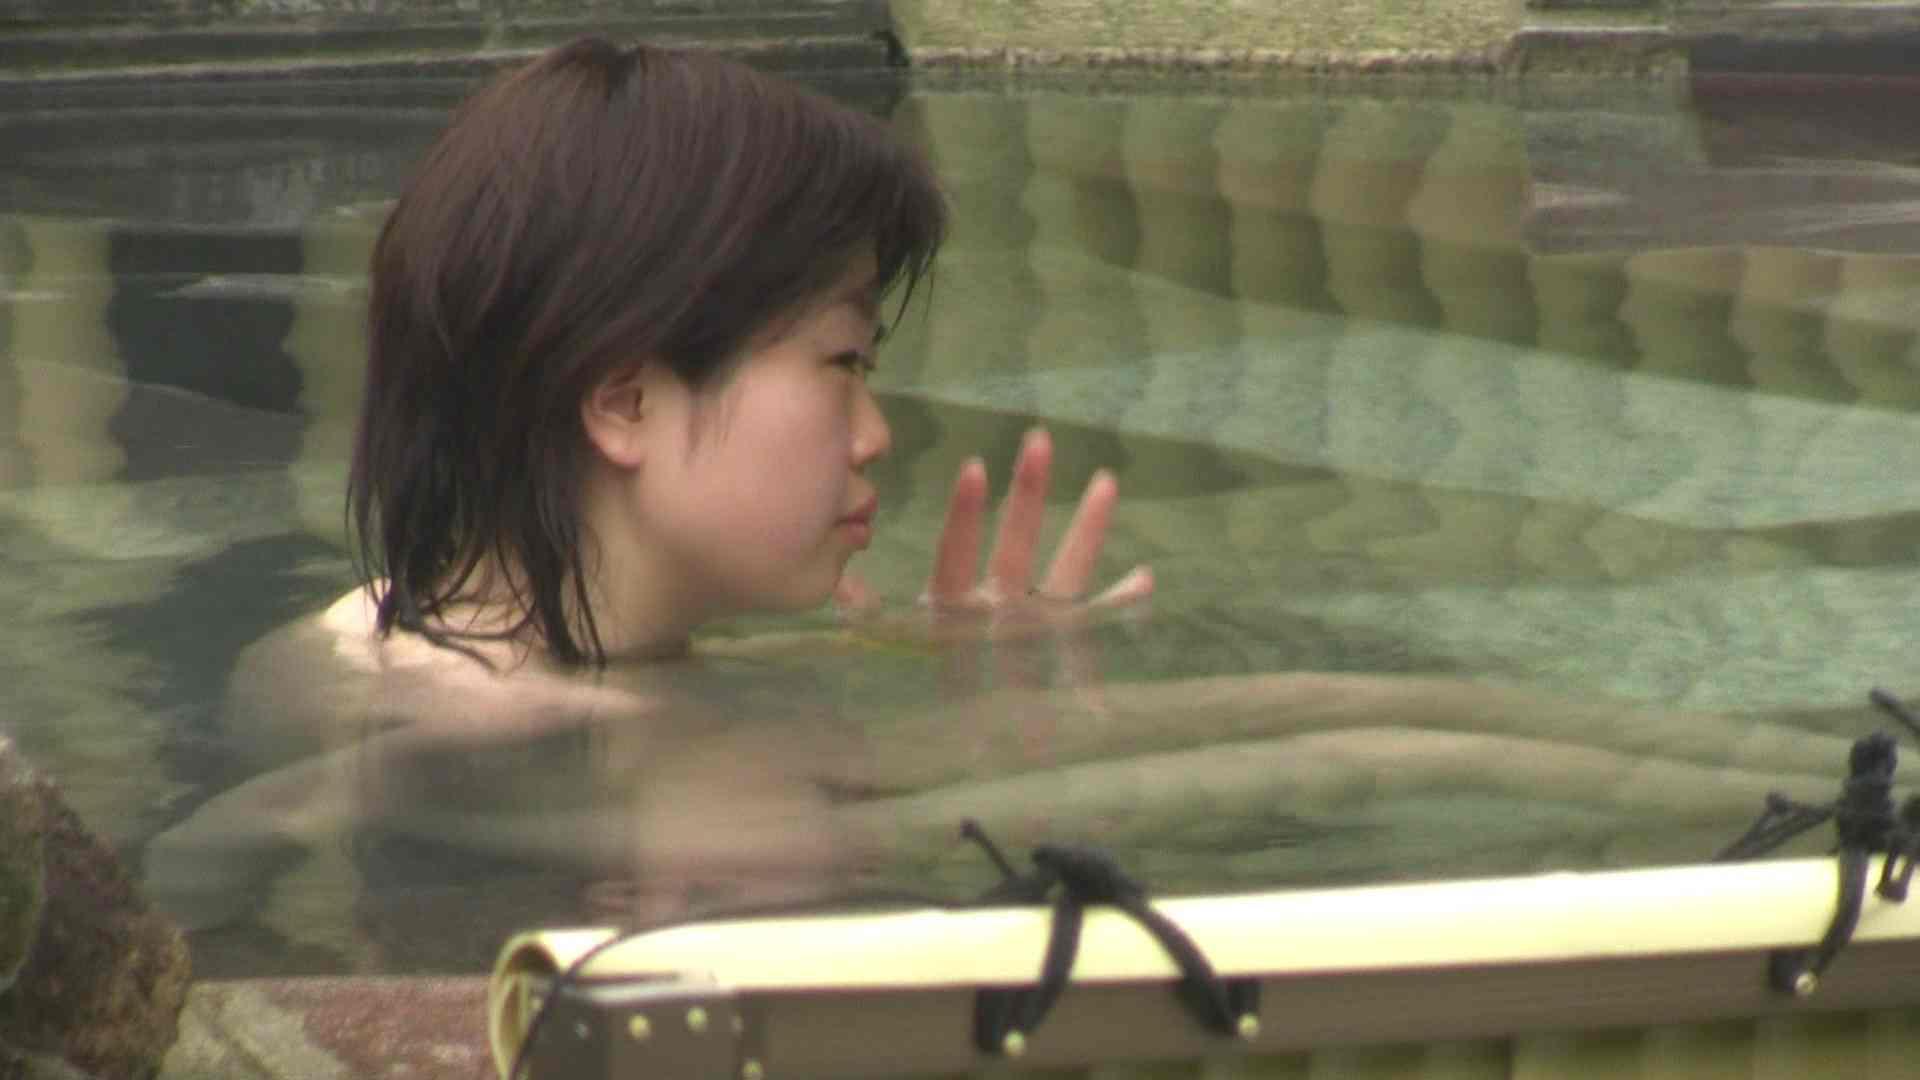 Aquaな露天風呂Vol.675 盗撮 | OLセックス  77画像 34